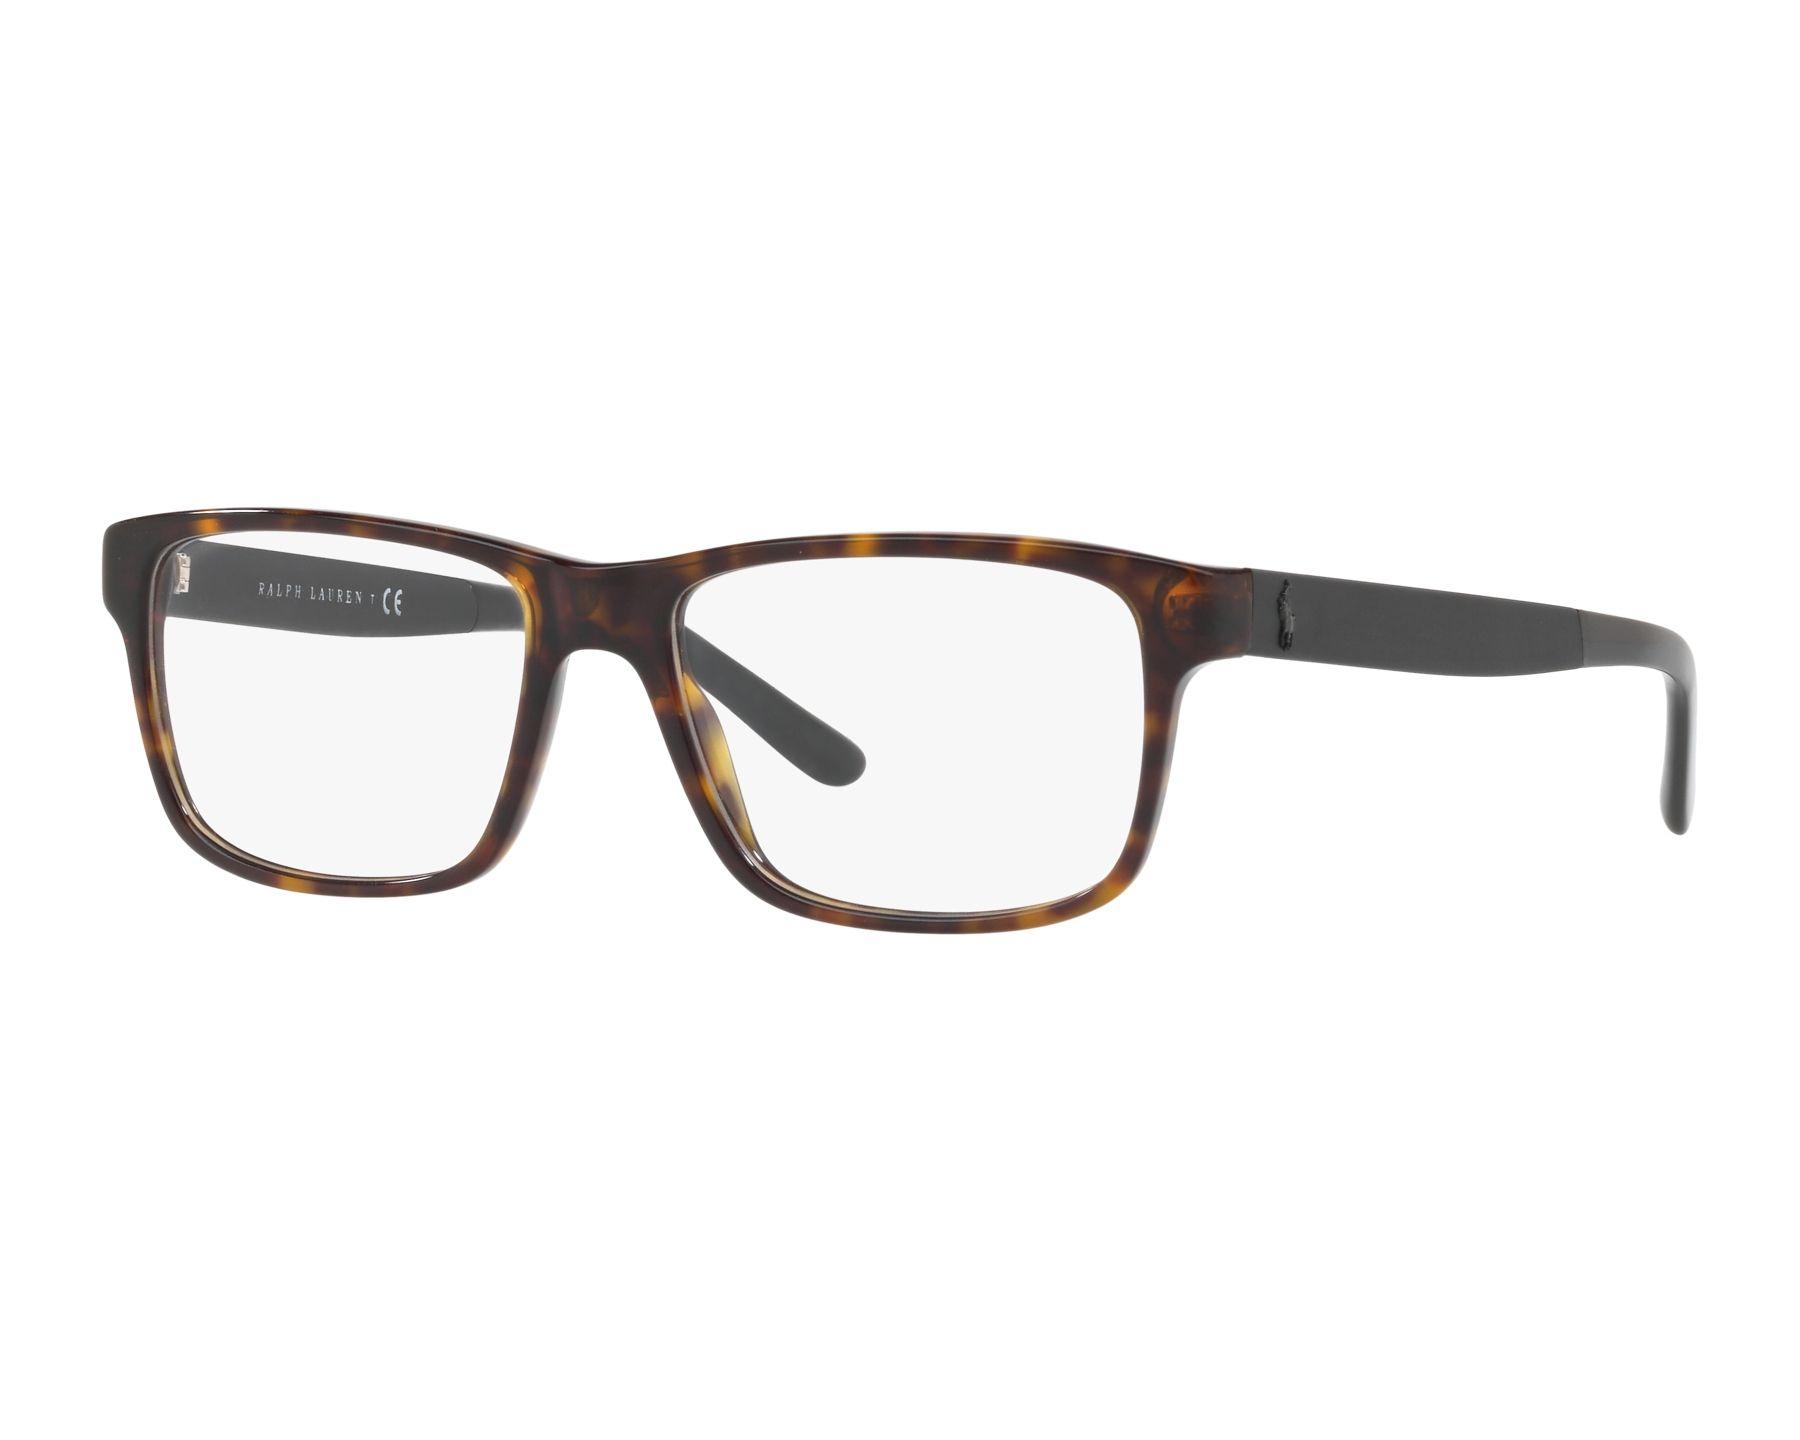 bd0d72ba67 Gafas Graduadas Polo Ralph Lauren PH-2181 5666 53-17 Havana Gris